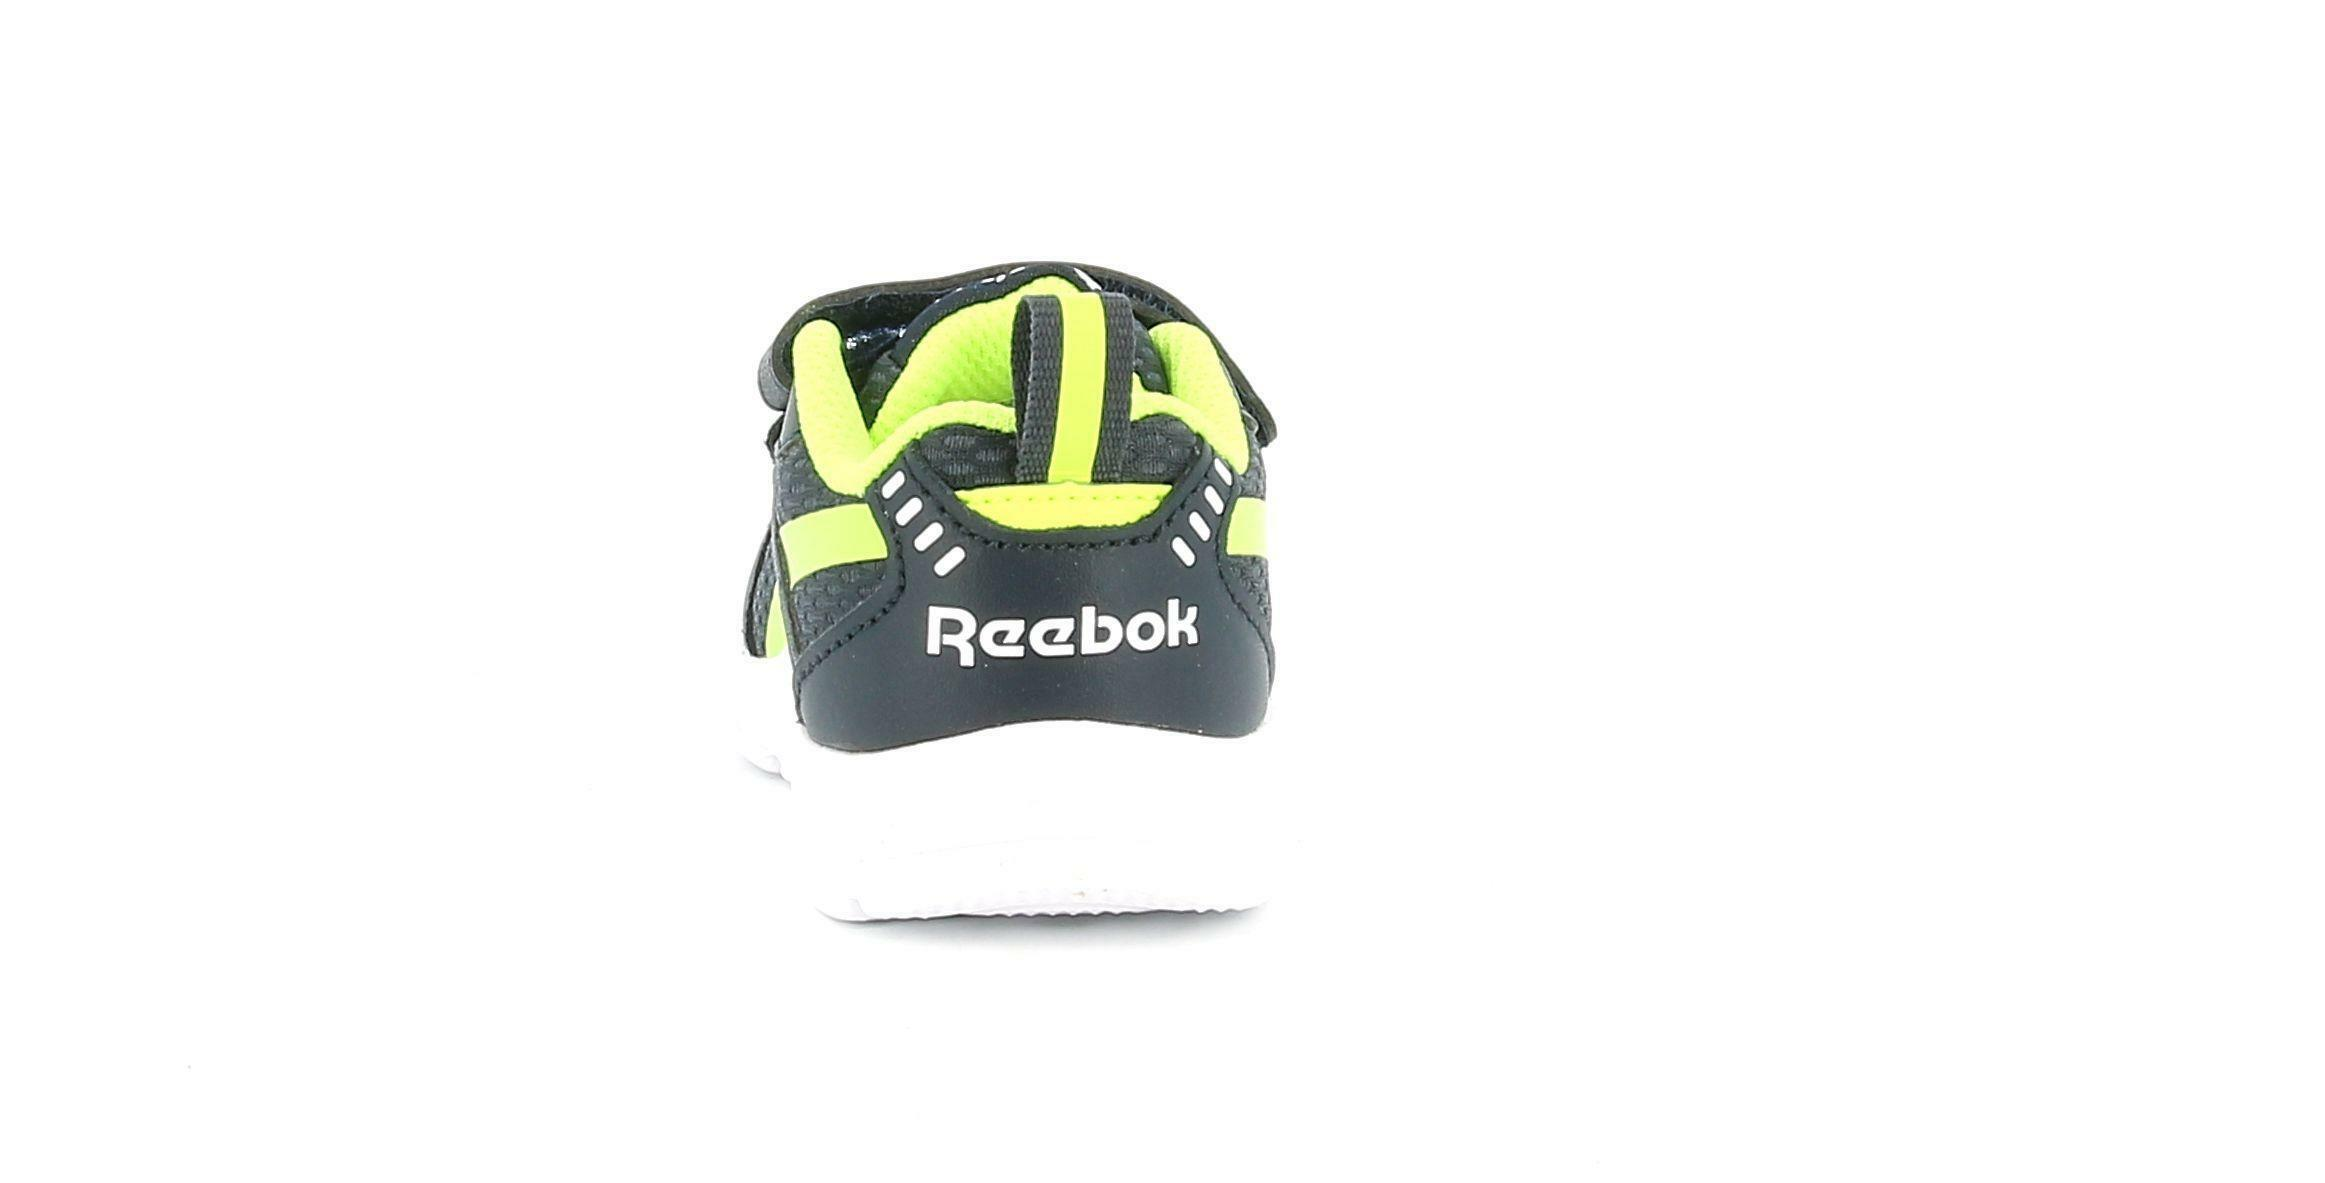 reebok reebok xt sprinter scarpe running unisex bimbi 0-24 fx2437